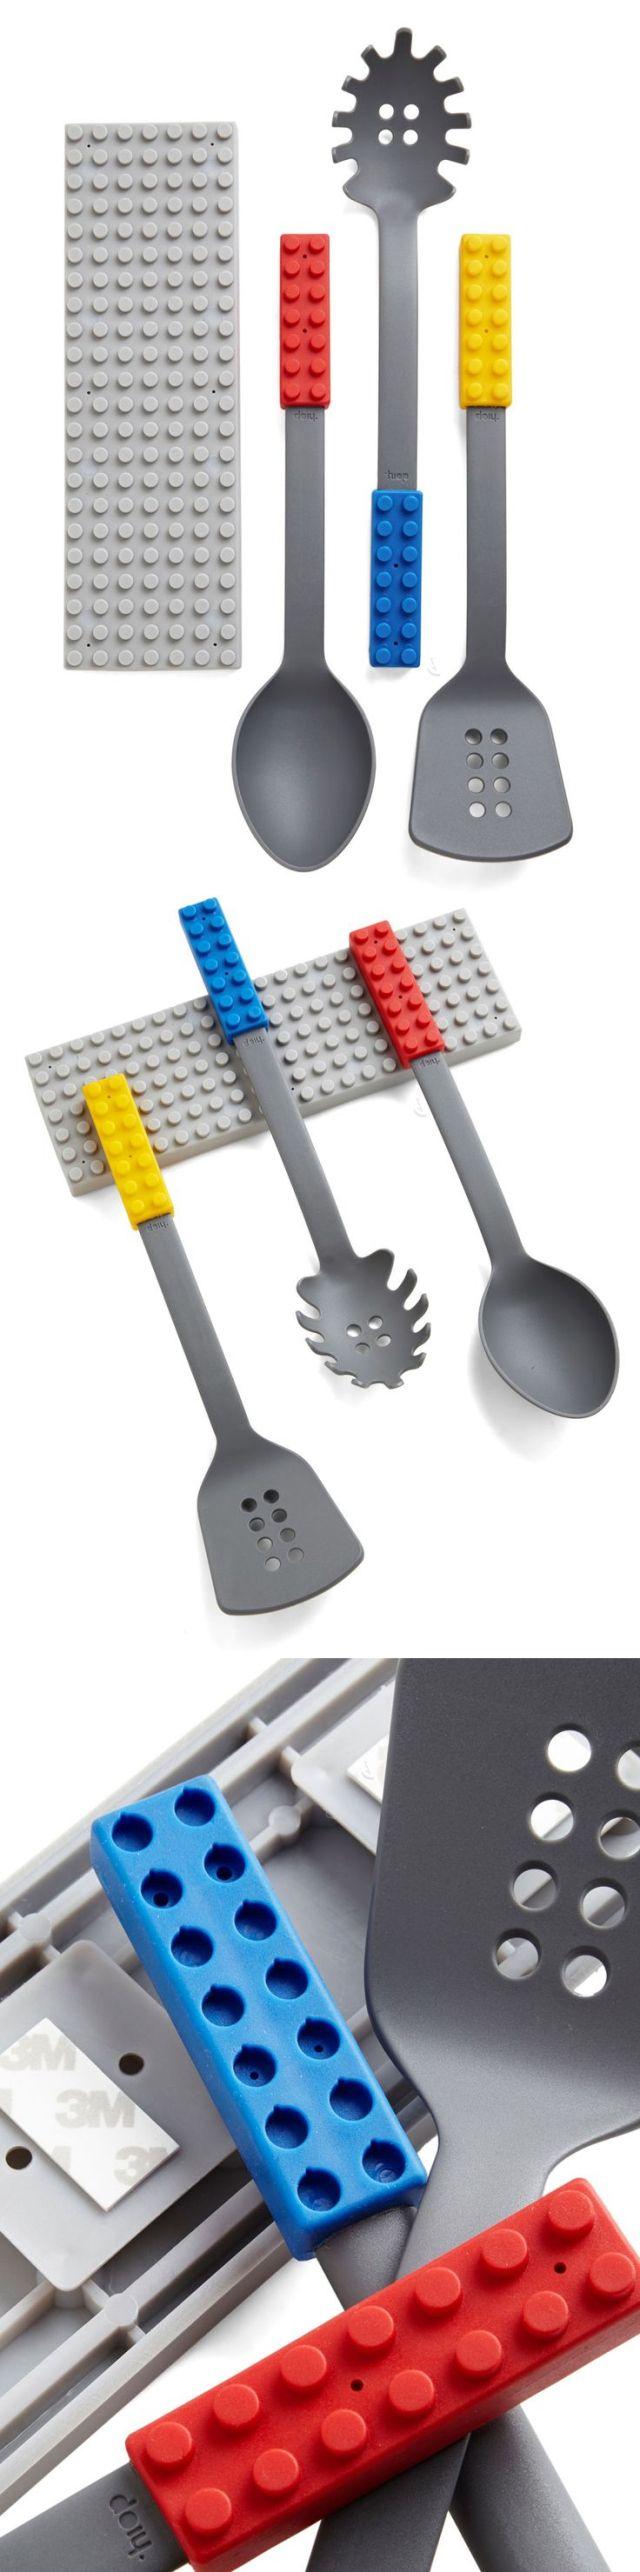 435 Best Unique Kitchen Gadgets, Utensils, U0026 Accessories Images On  Pinterest | Kitchen Stuff, Kitchen Things And Kitchen Tools